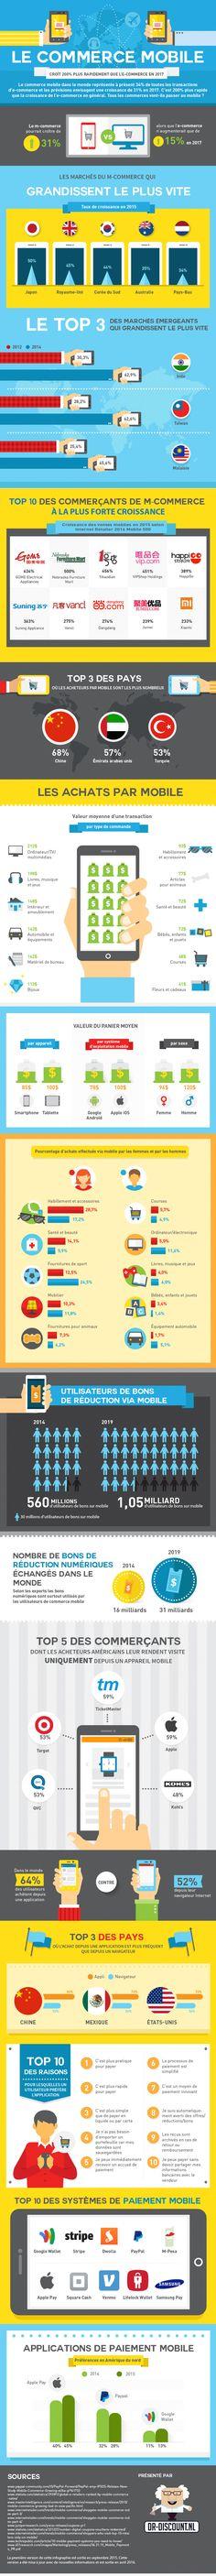 infographie m commerce